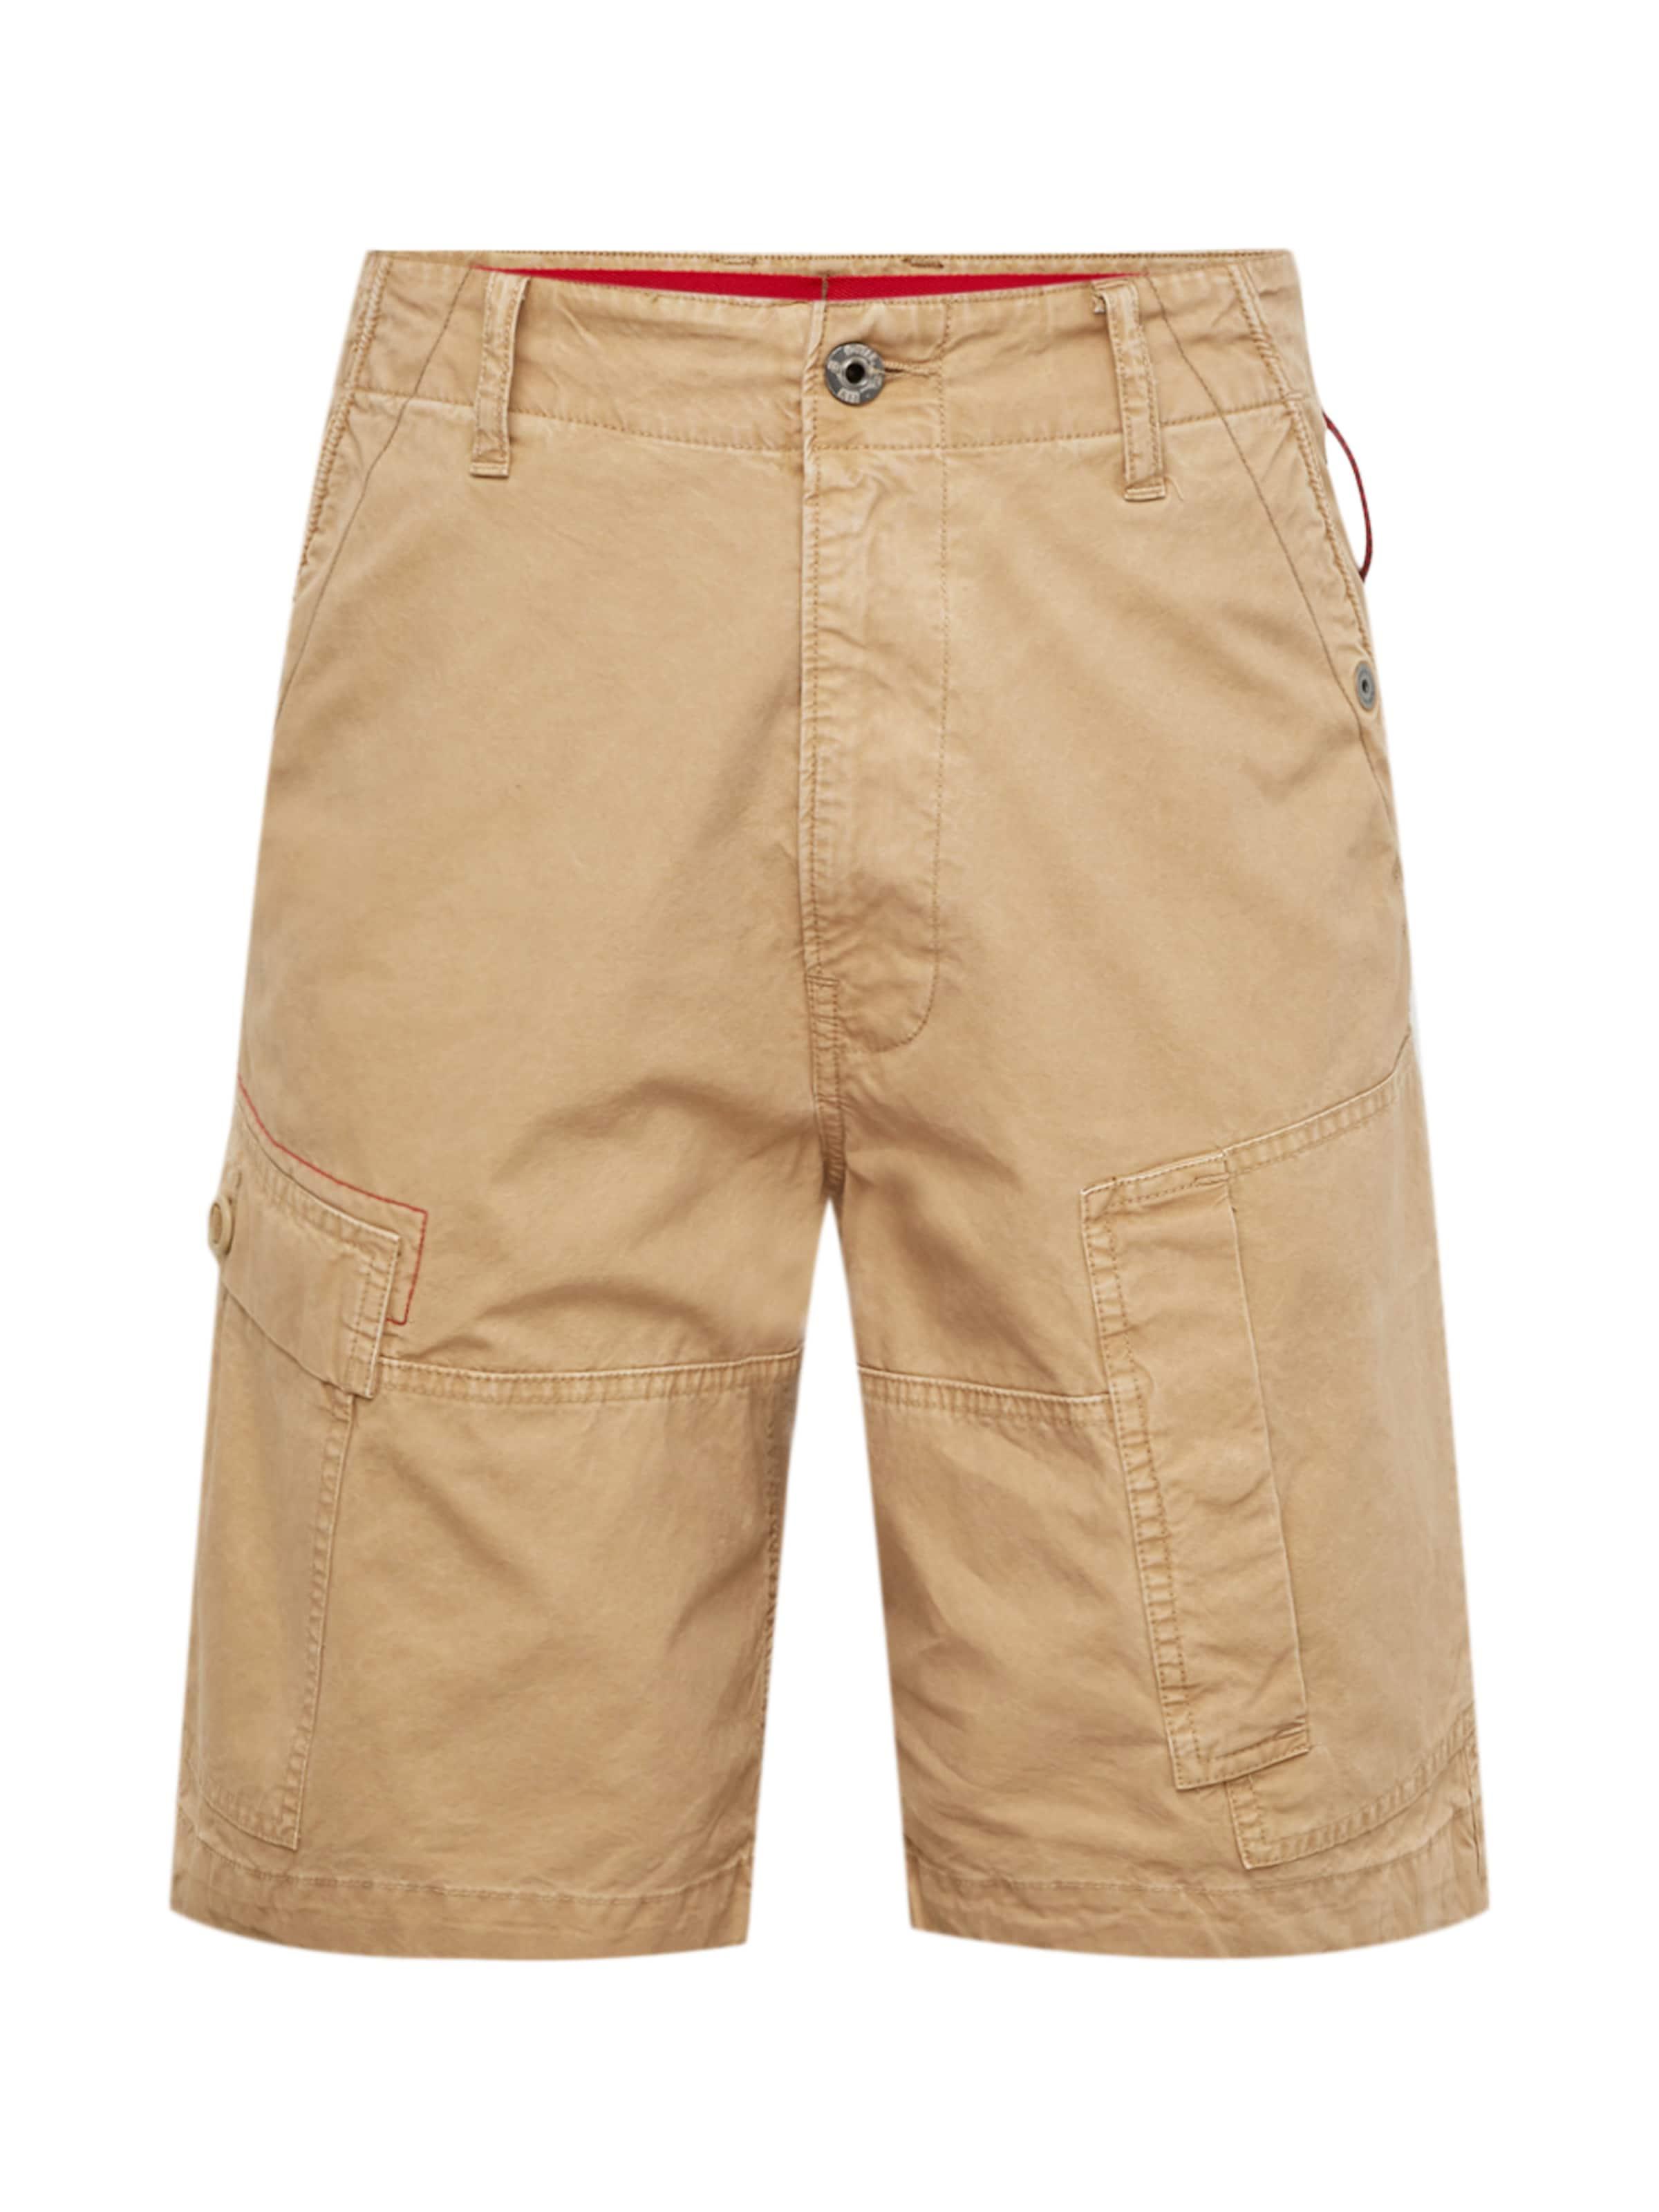 Hellbeige G In Shorts Raw star mvnON8w0